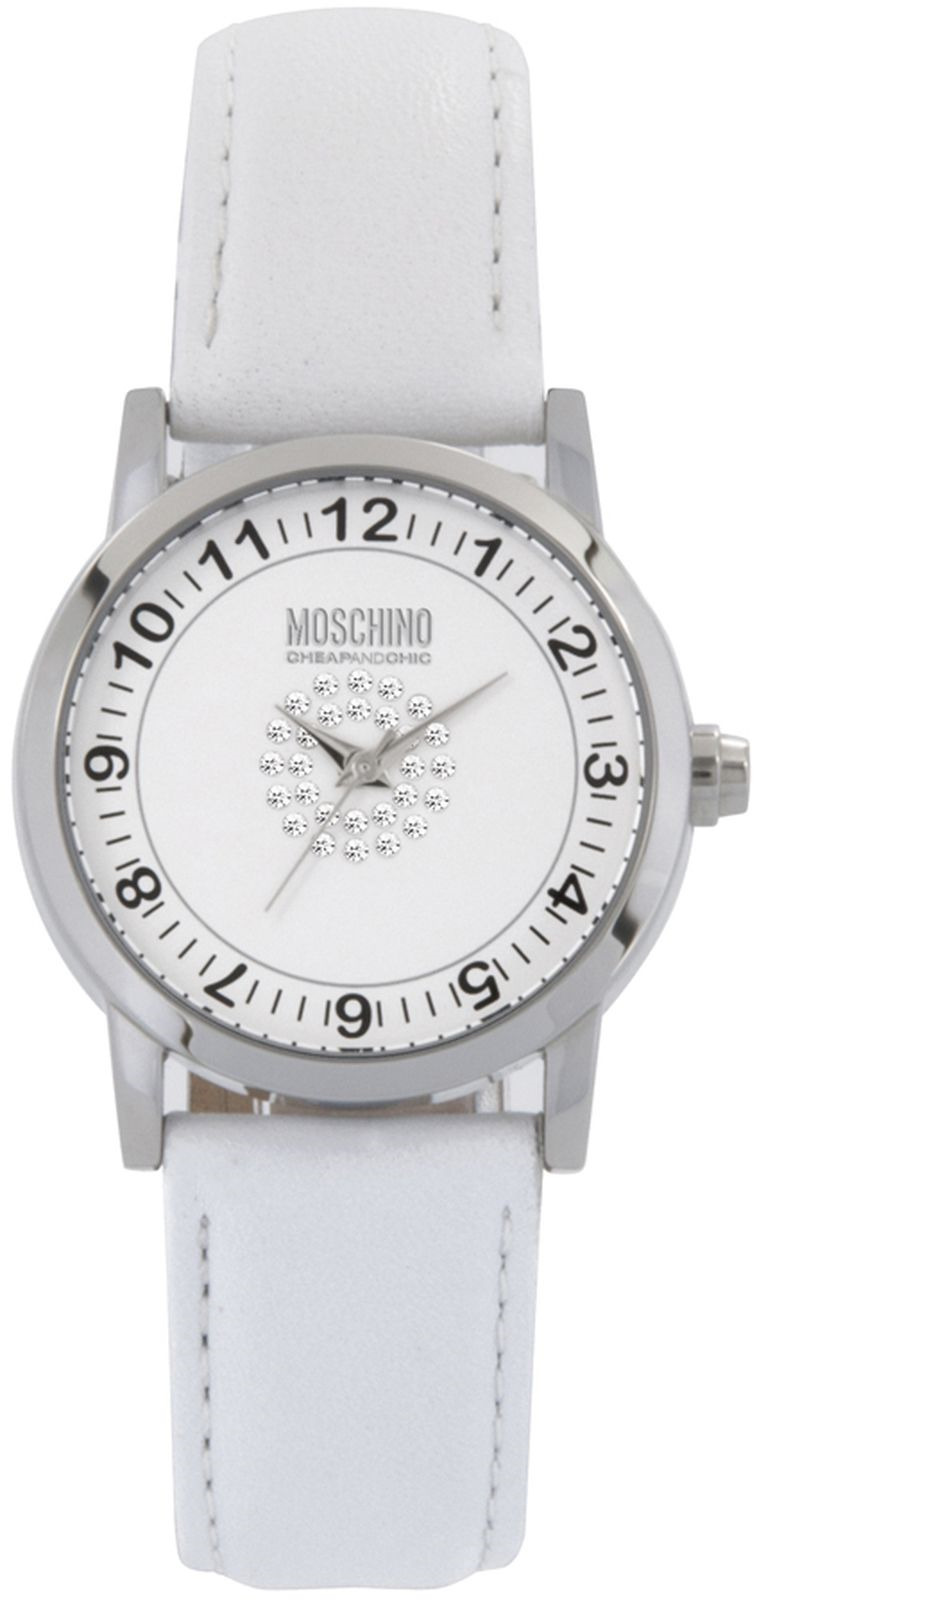 Наручные часы Moschino женские, белый все цены